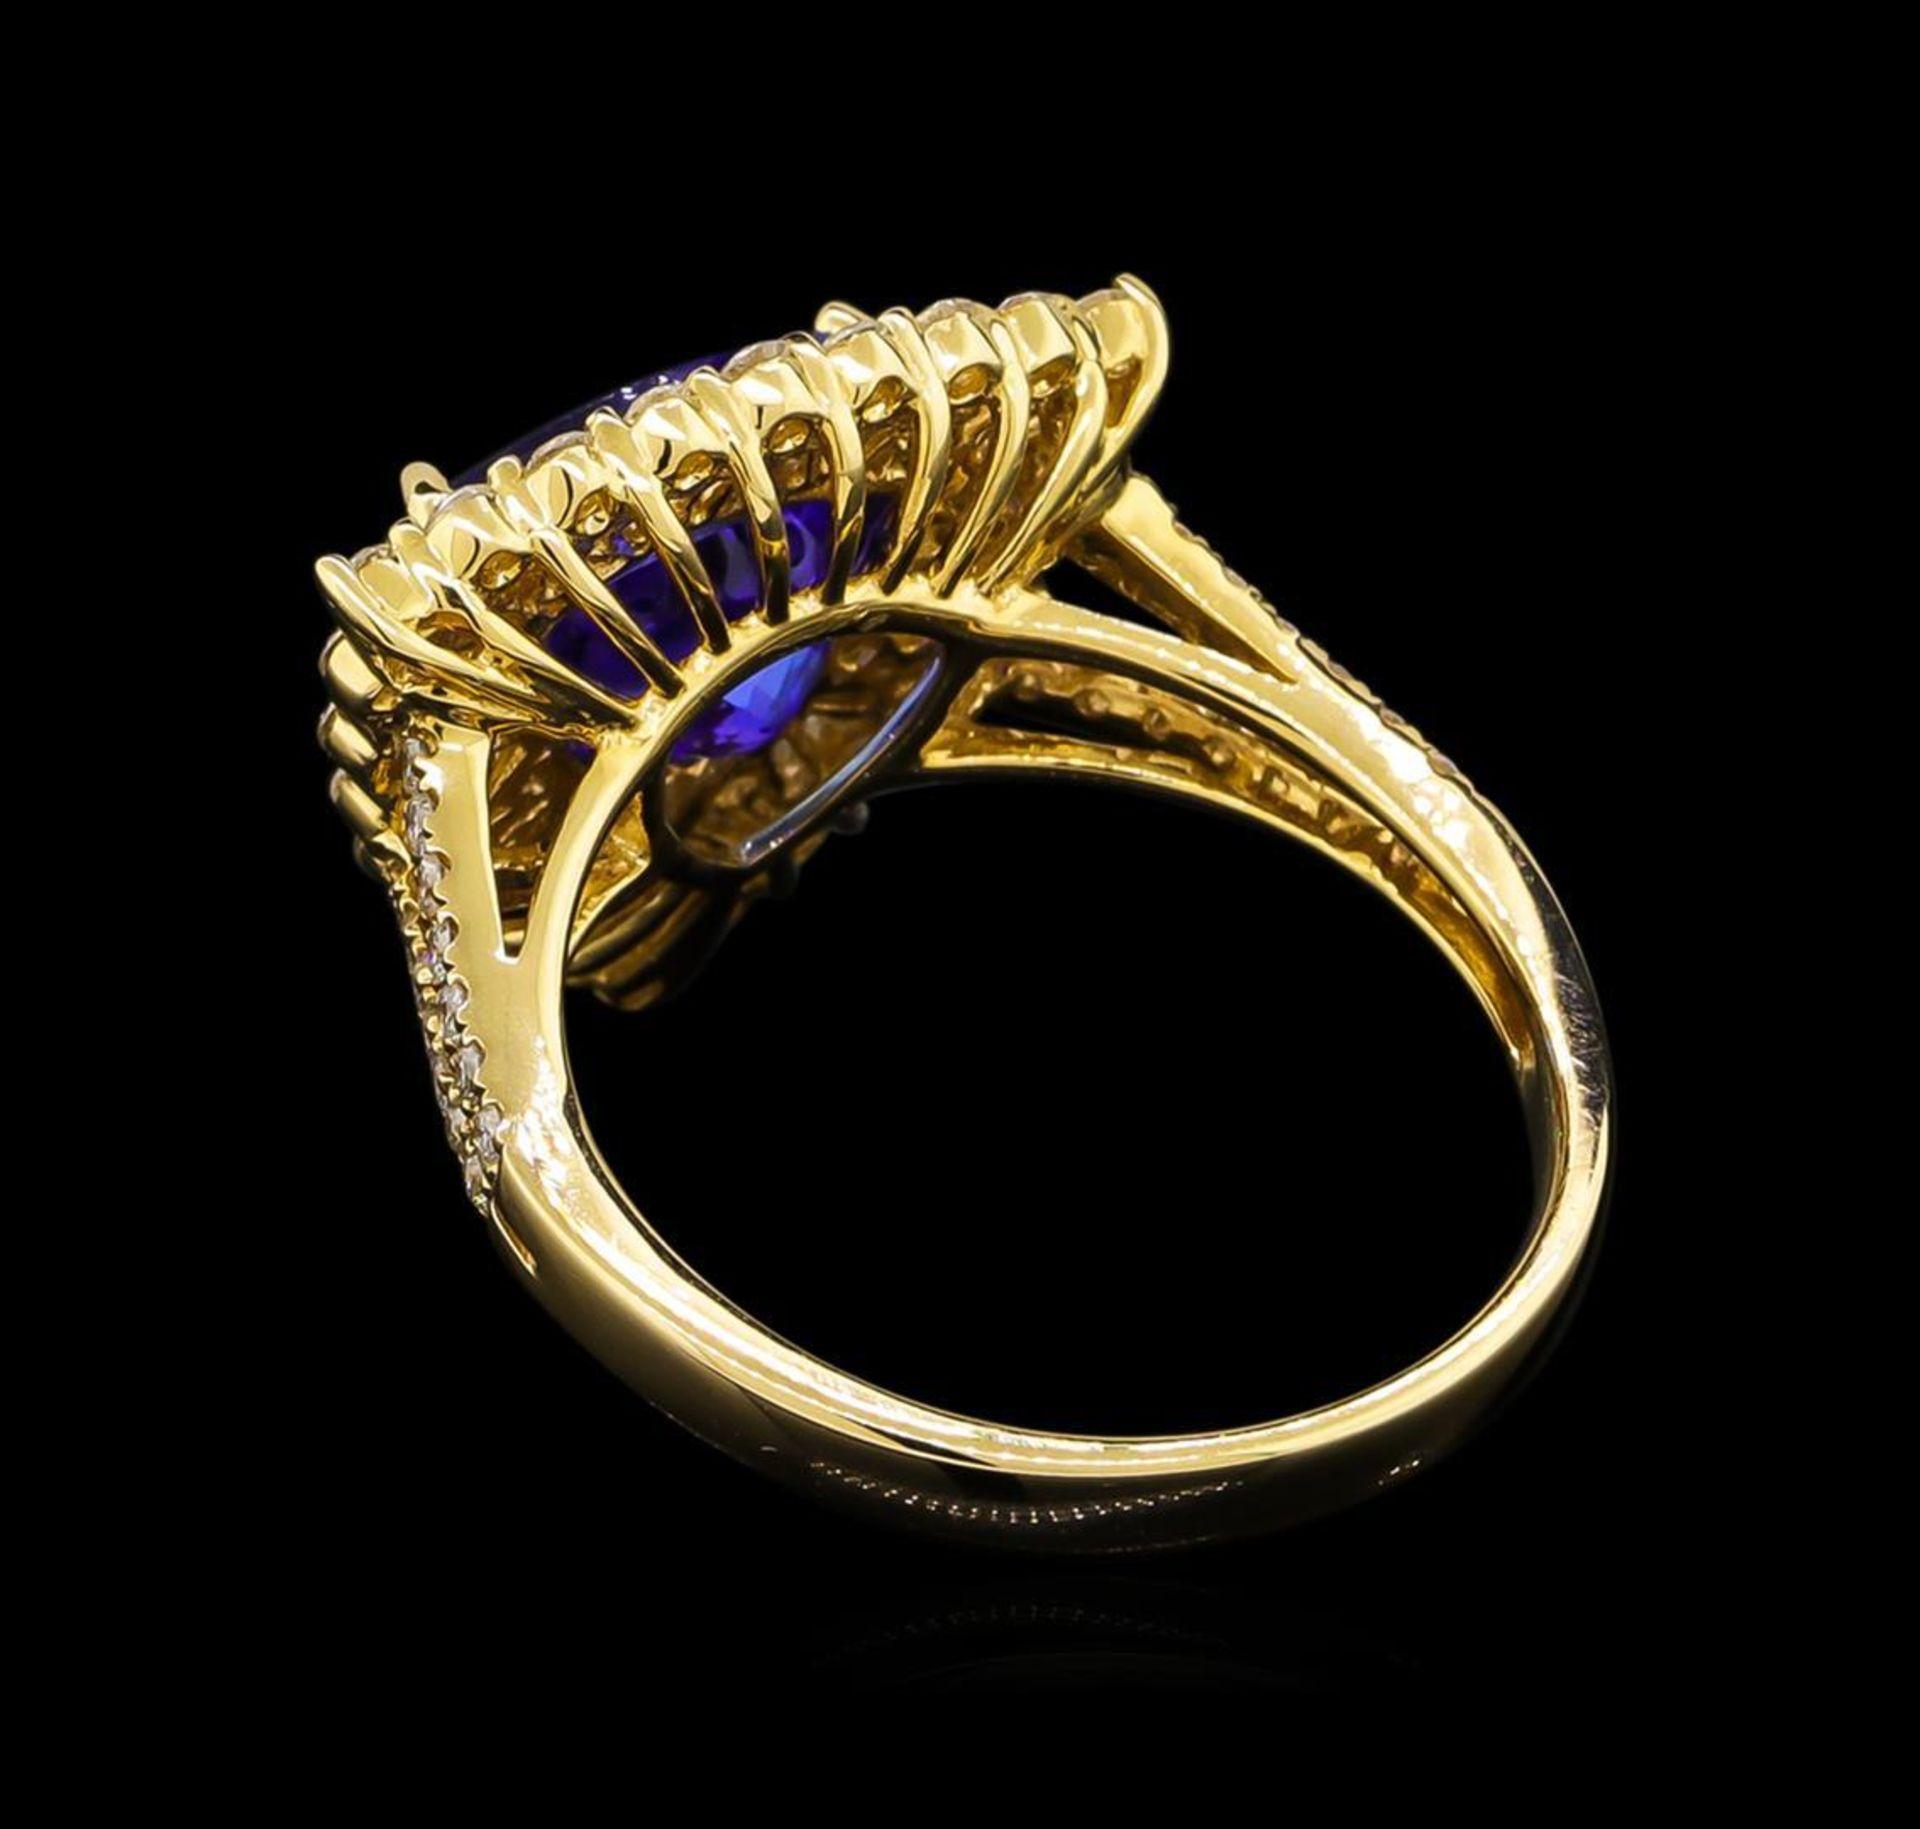 14KT Yellow Gold 2.86 ctw Tanzanite and Diamond Ring - Image 3 of 5